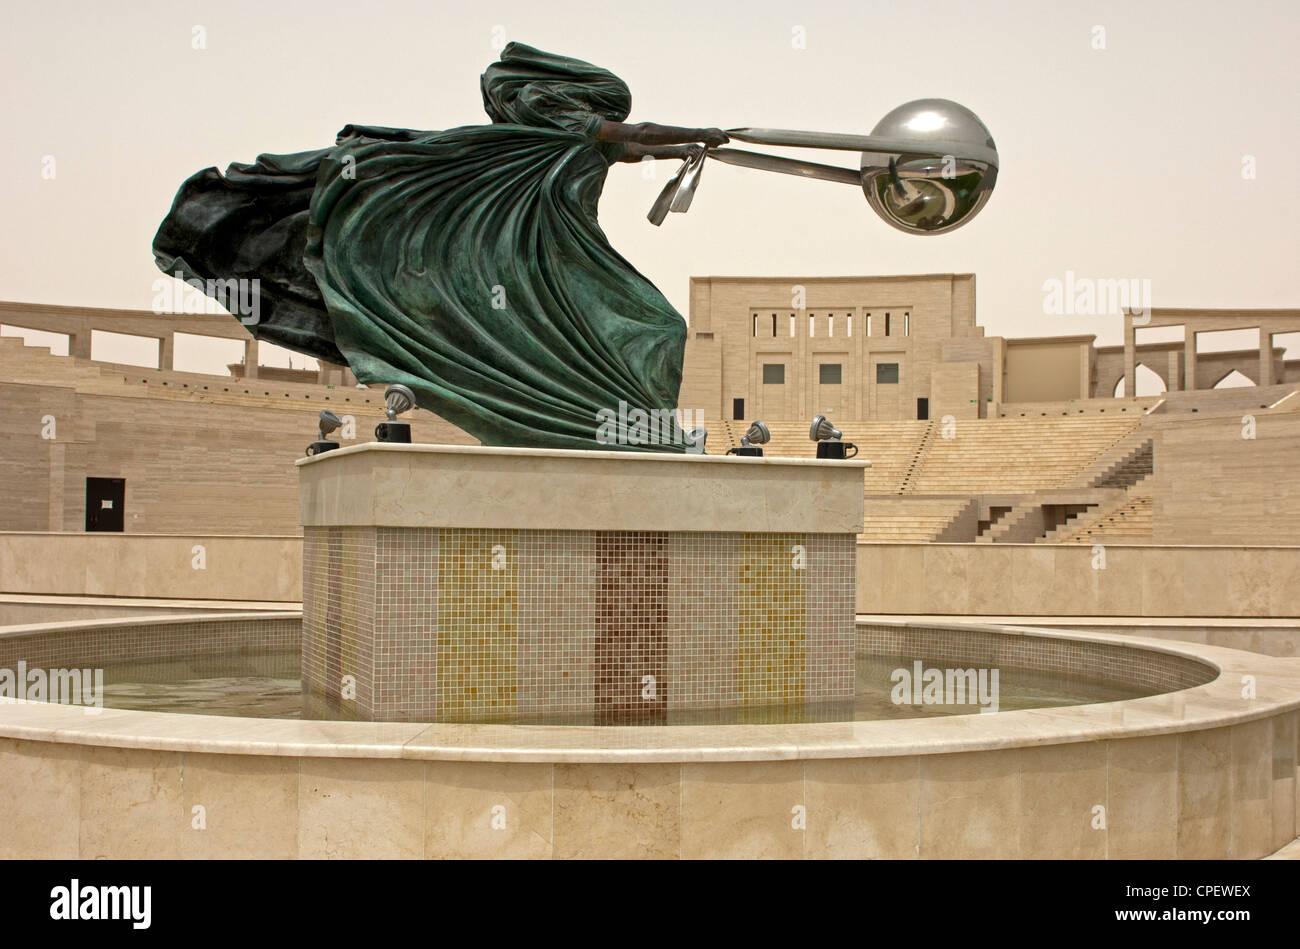 Sculpture Force of Nature by Lorenzo Quinn, Katara Cultural Village, Doha, Qatar - Stock Image